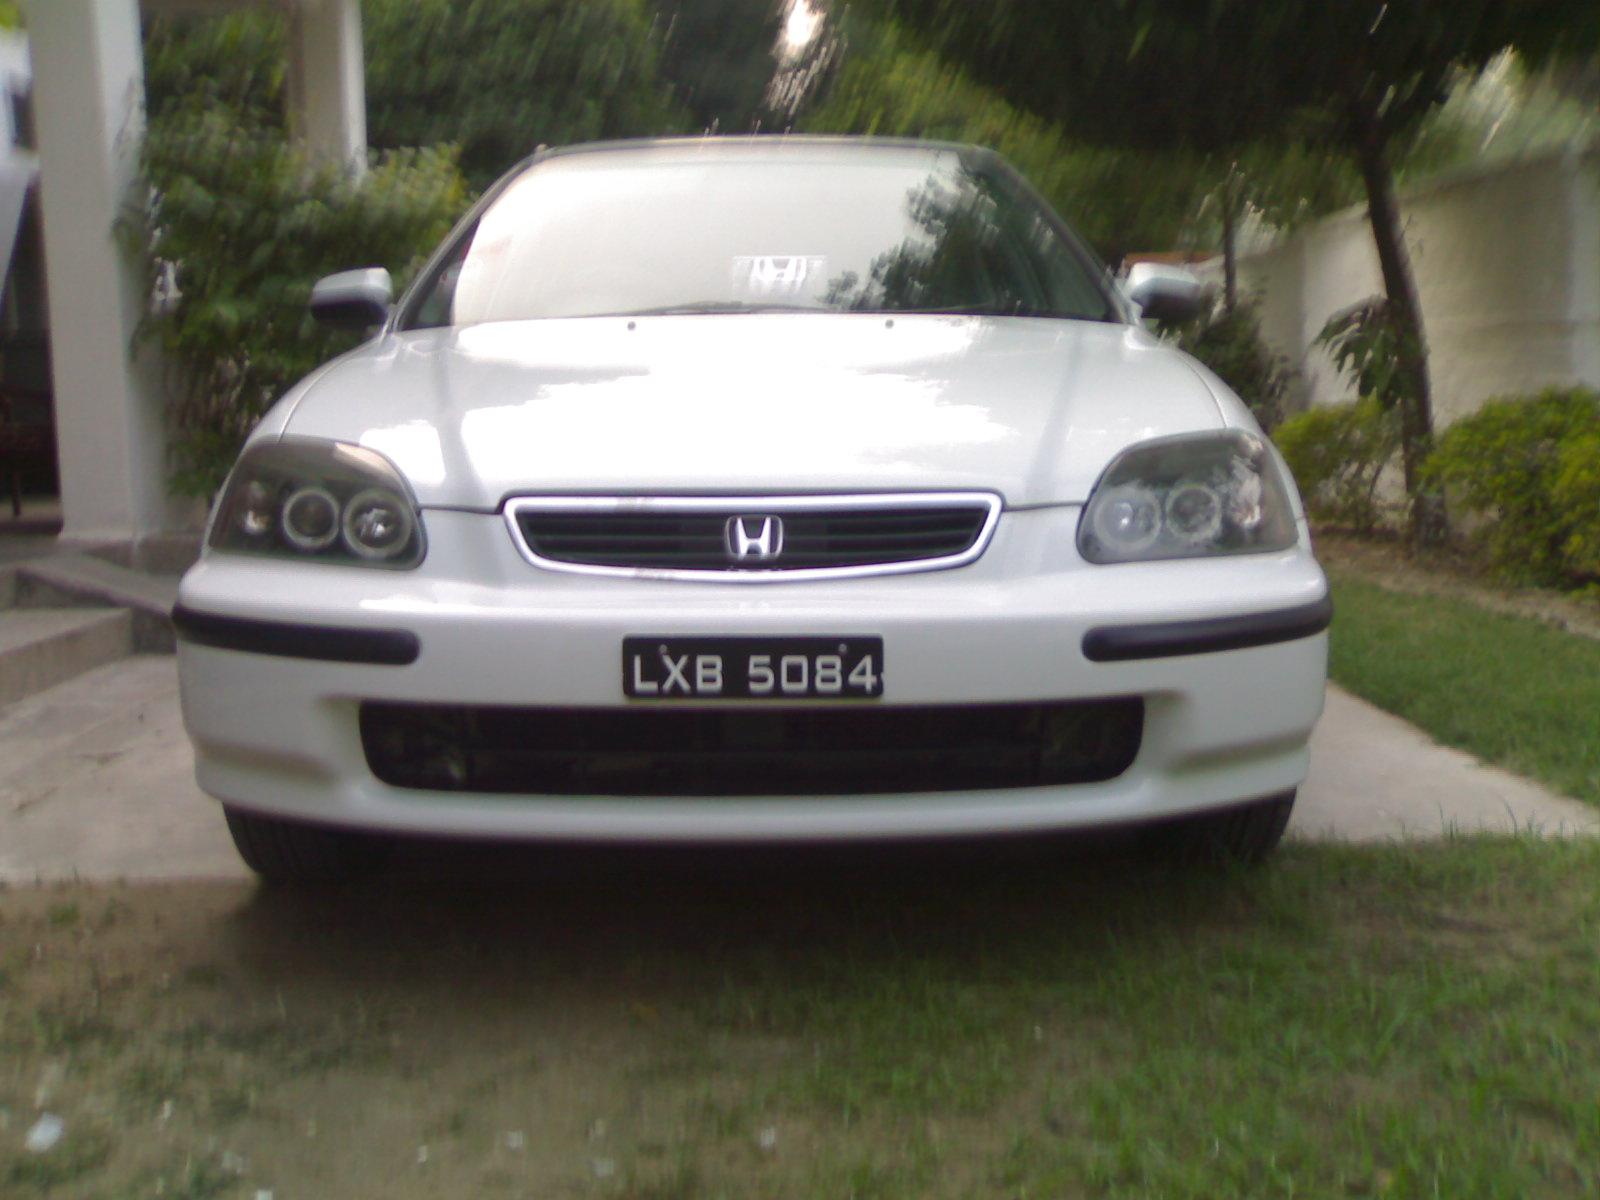 Honda Civic 1997 of car_bus2008 - Member Ride 14034 | PakWheels